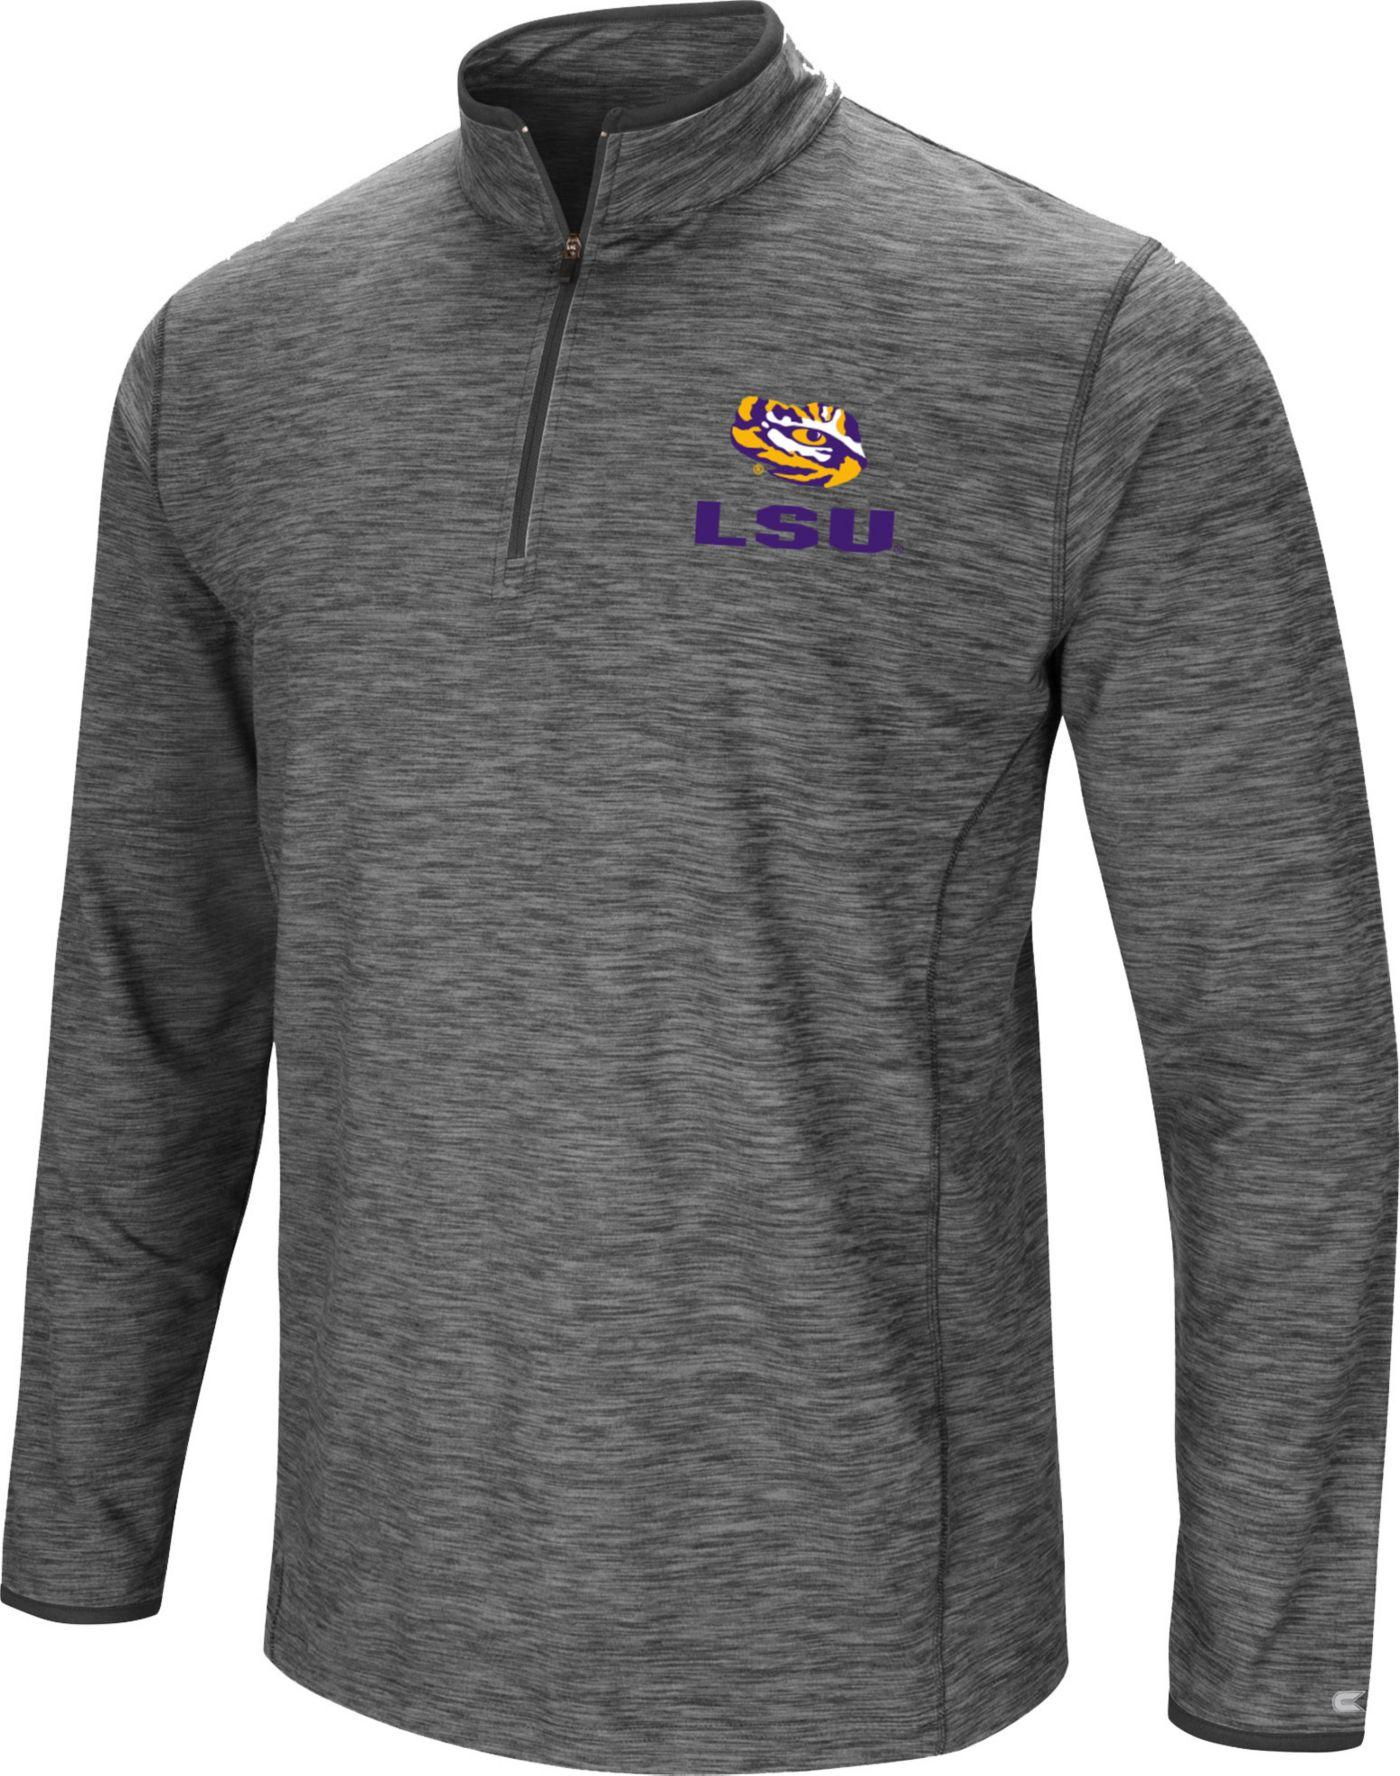 Colosseum Men's LSU Tigers Grey Action Pass Quarter-Zip Shirt